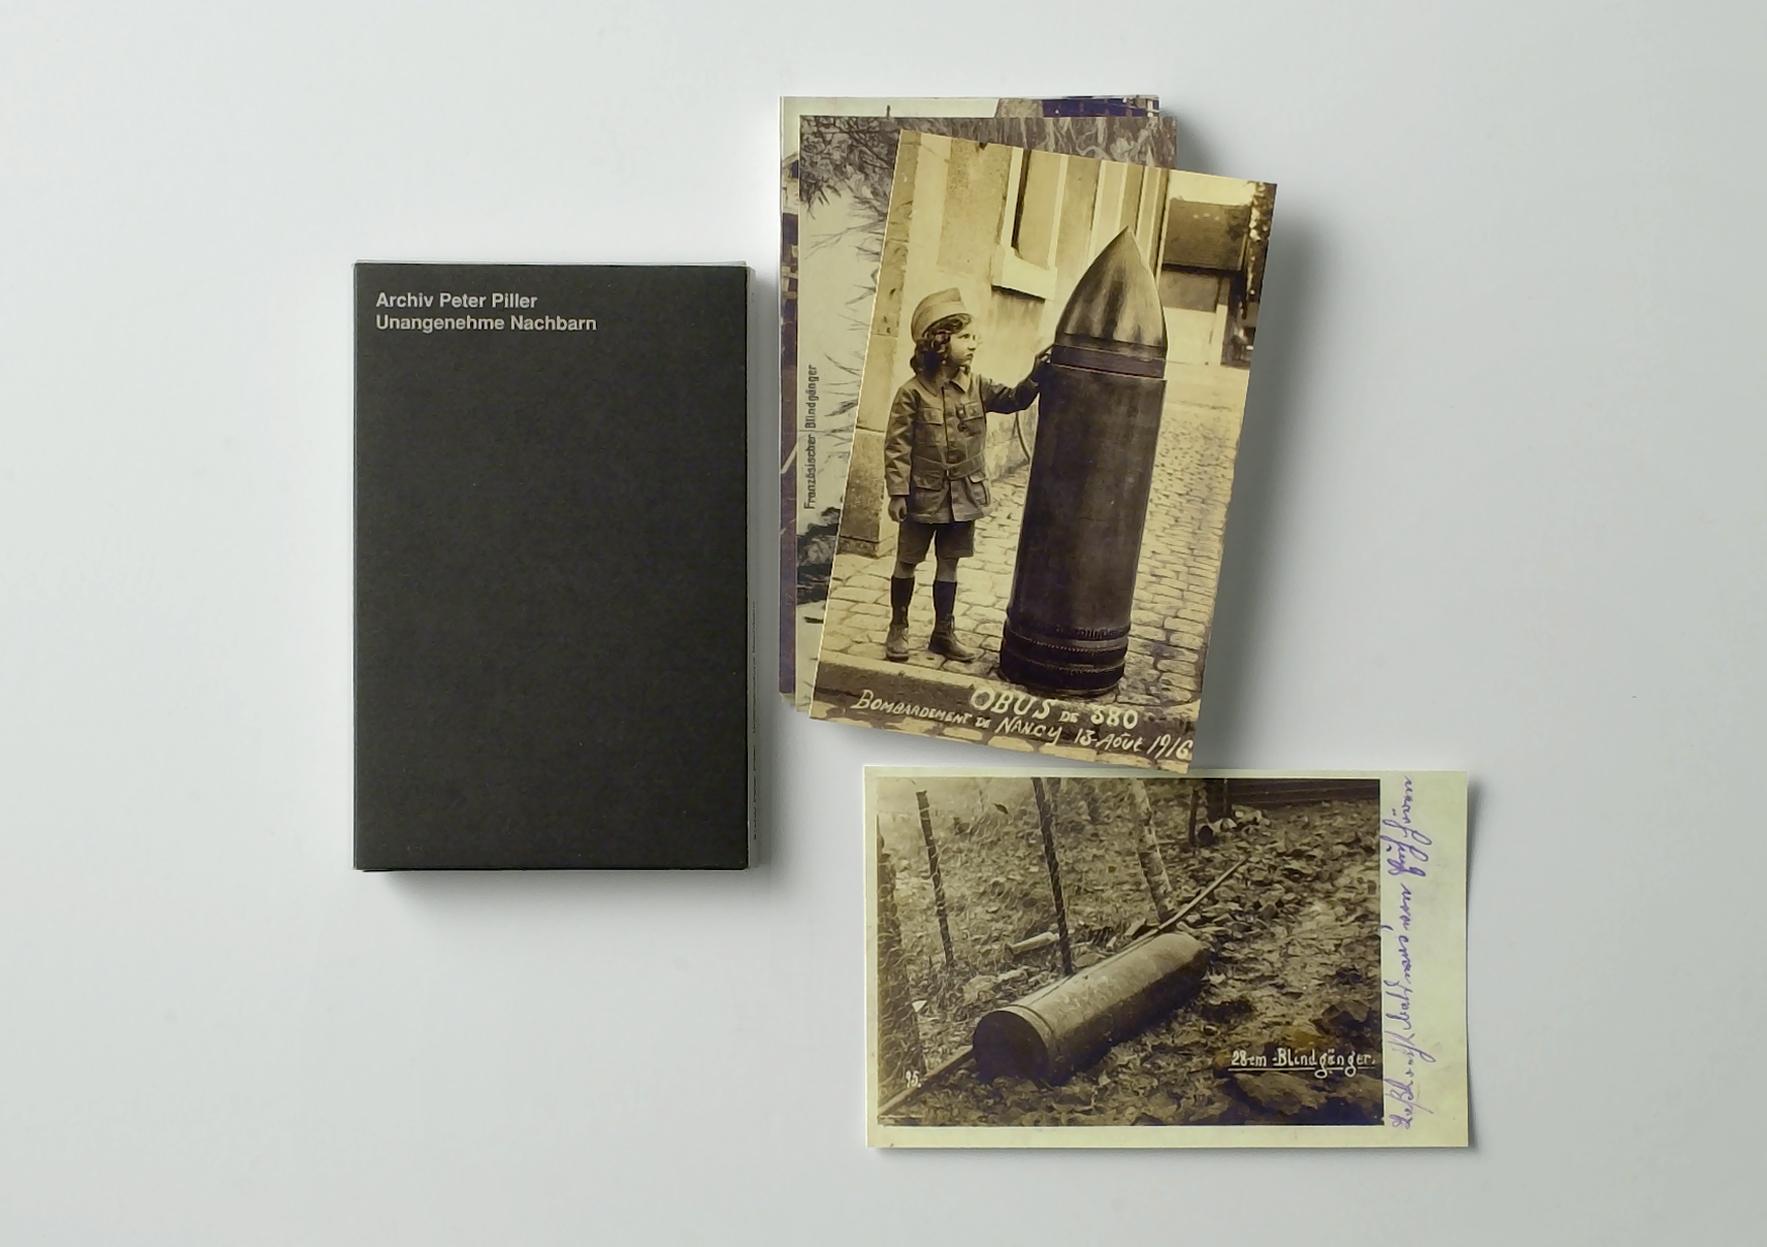 | Archiv Peter Piller. Unangenehme Nachbarn | ProjecteSD